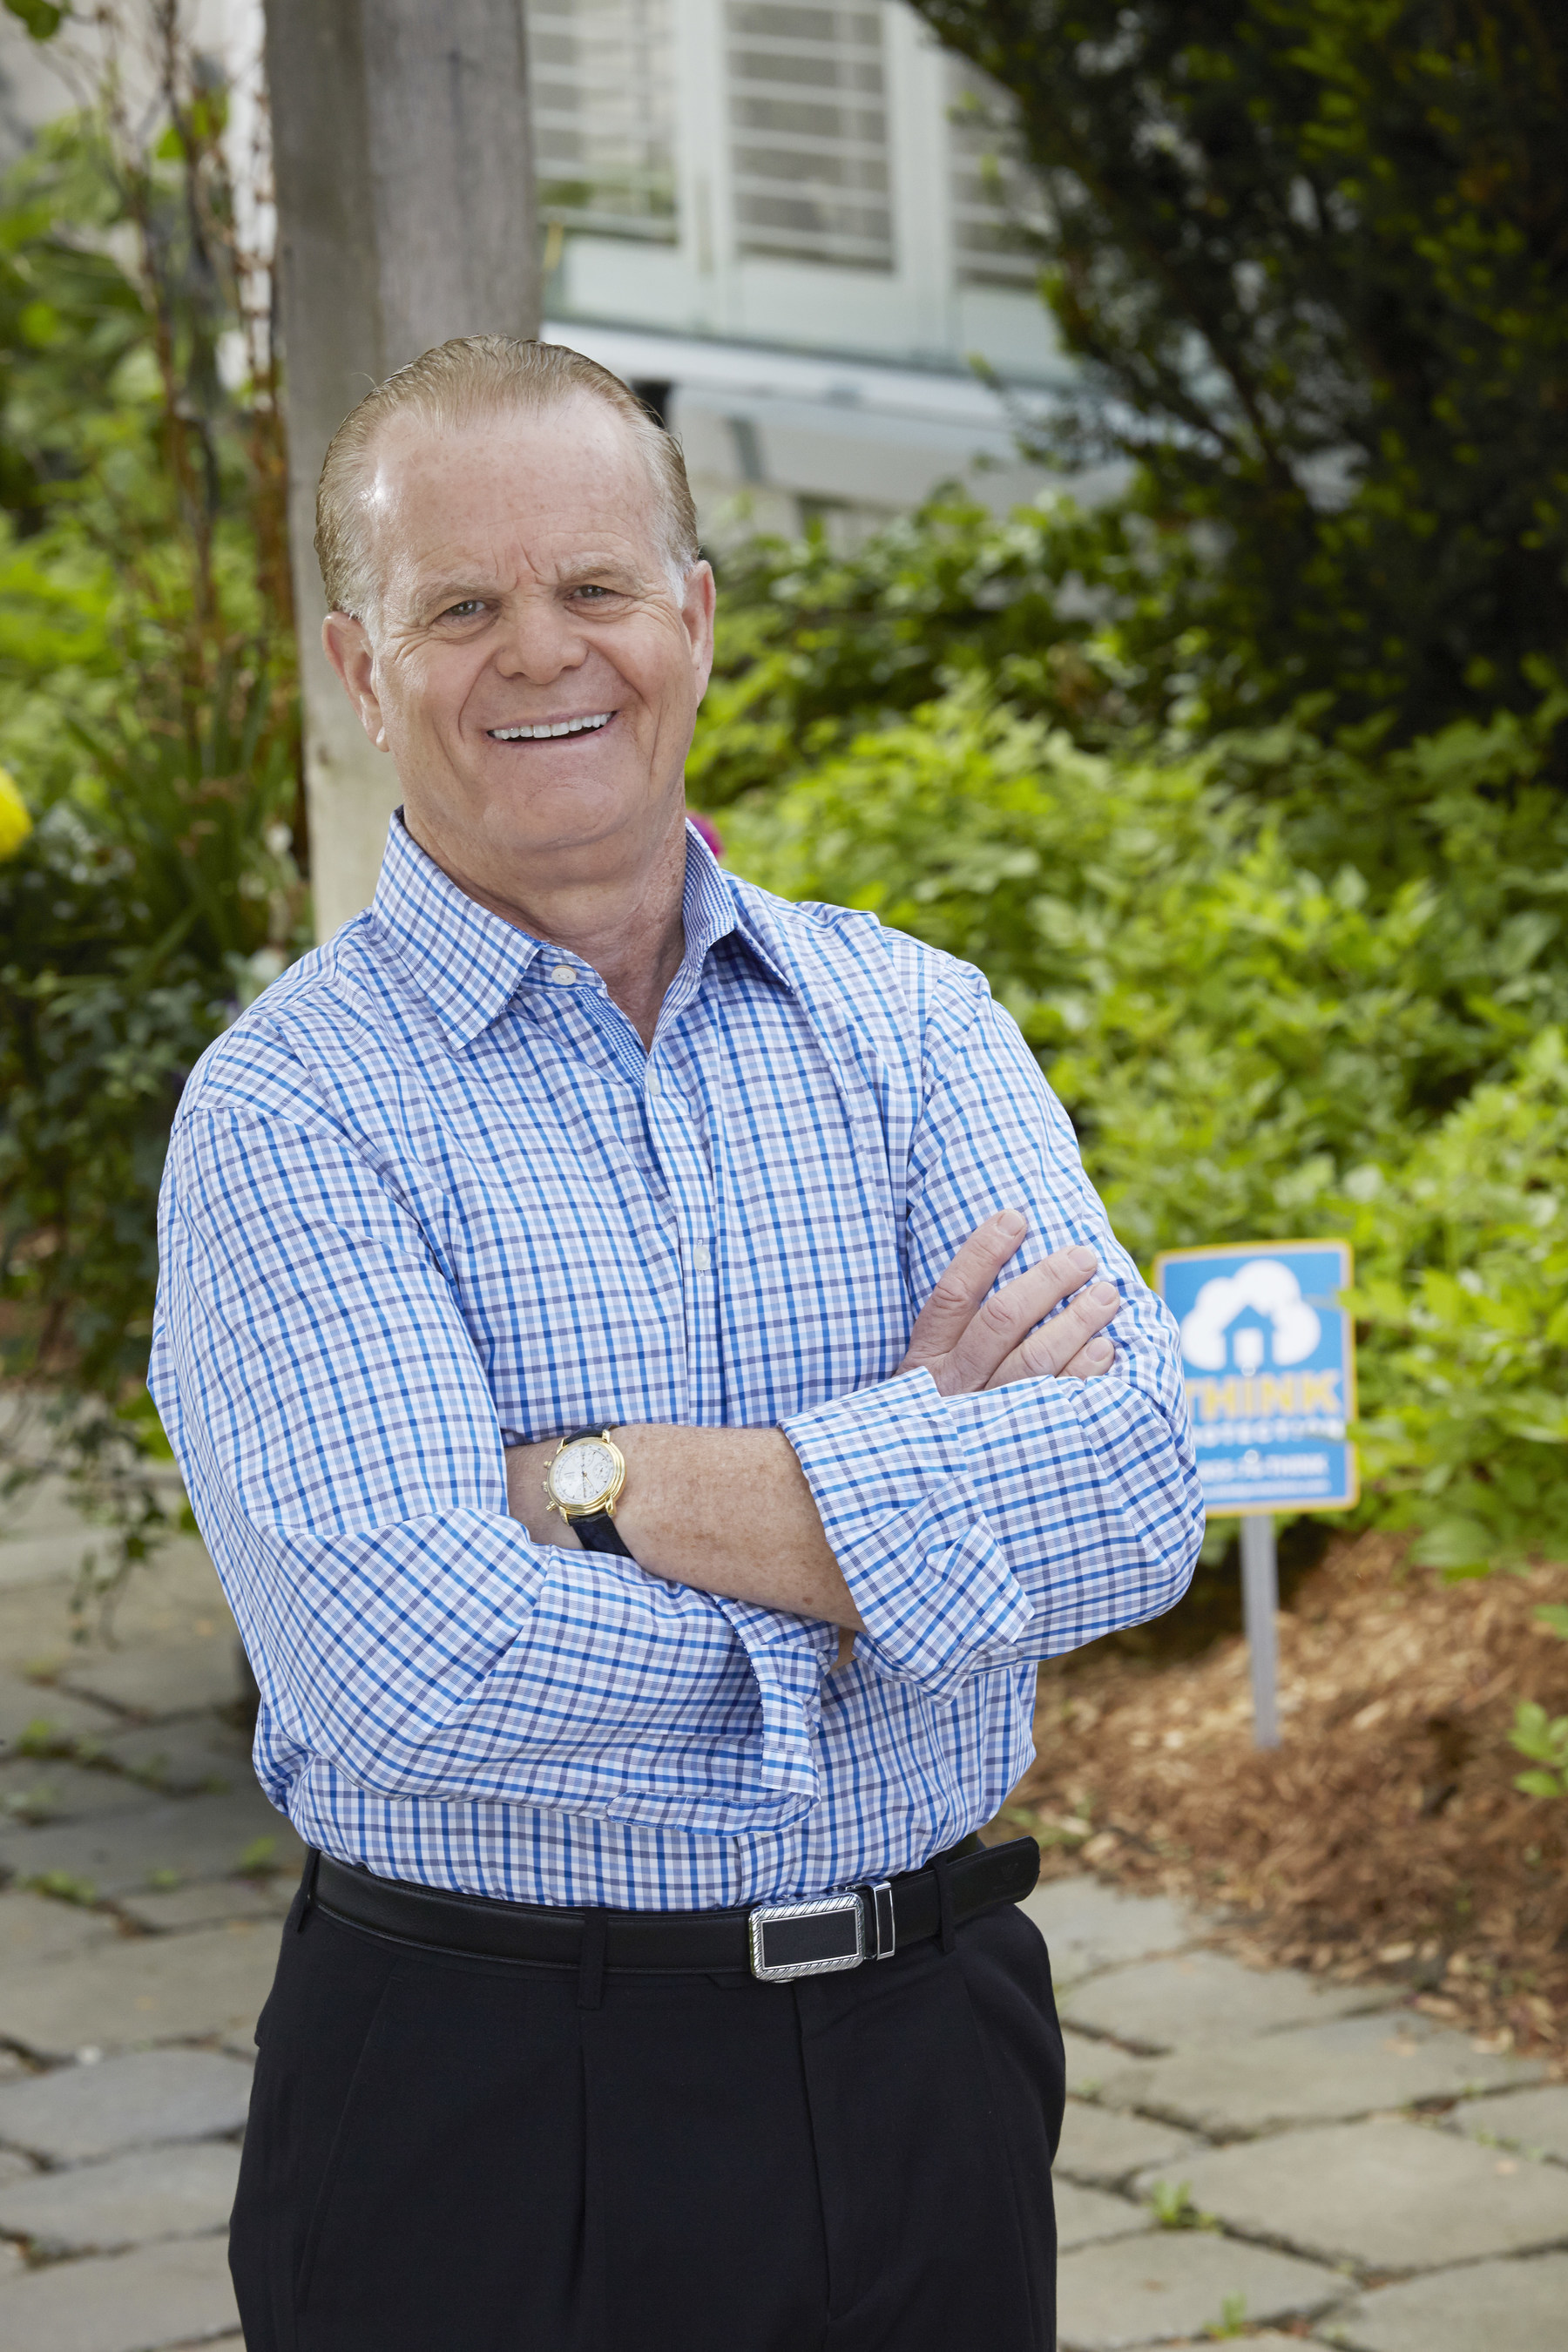 Settlement Reached in Joel Matlin's $11.3 Million Lawsuit Against AlarmForce